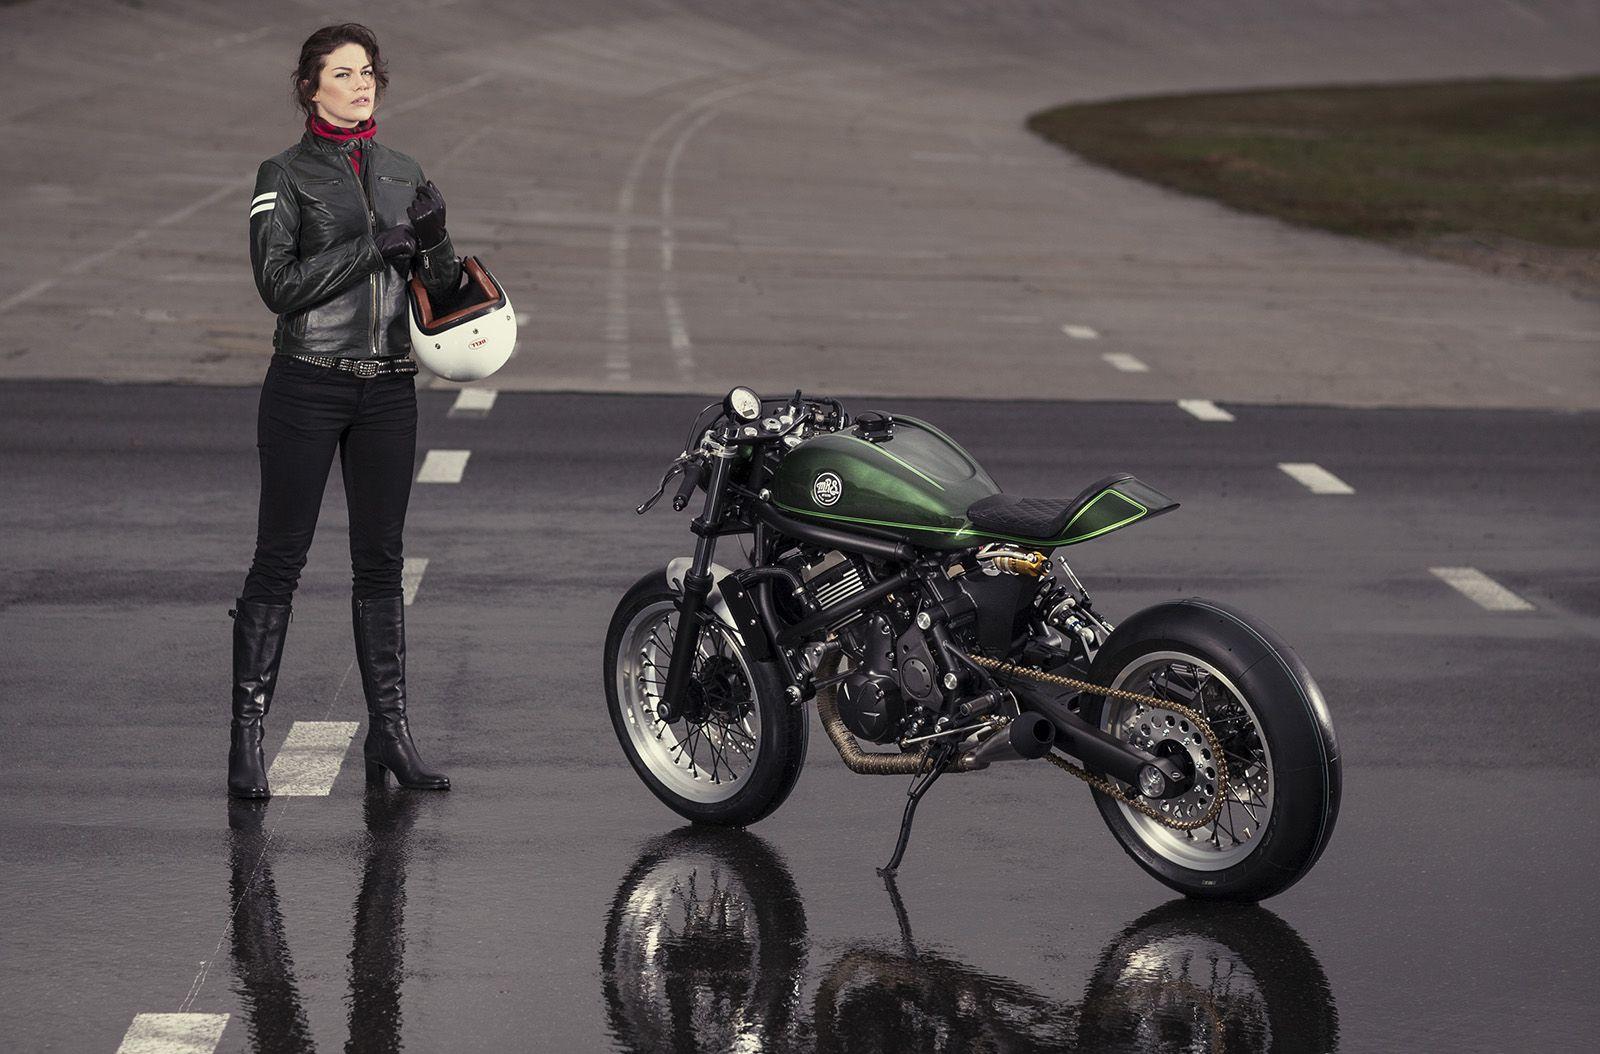 Kawasaki Vulcan S Cafe Racer By MRS Oficina Impresionante El Trabajo Que Han